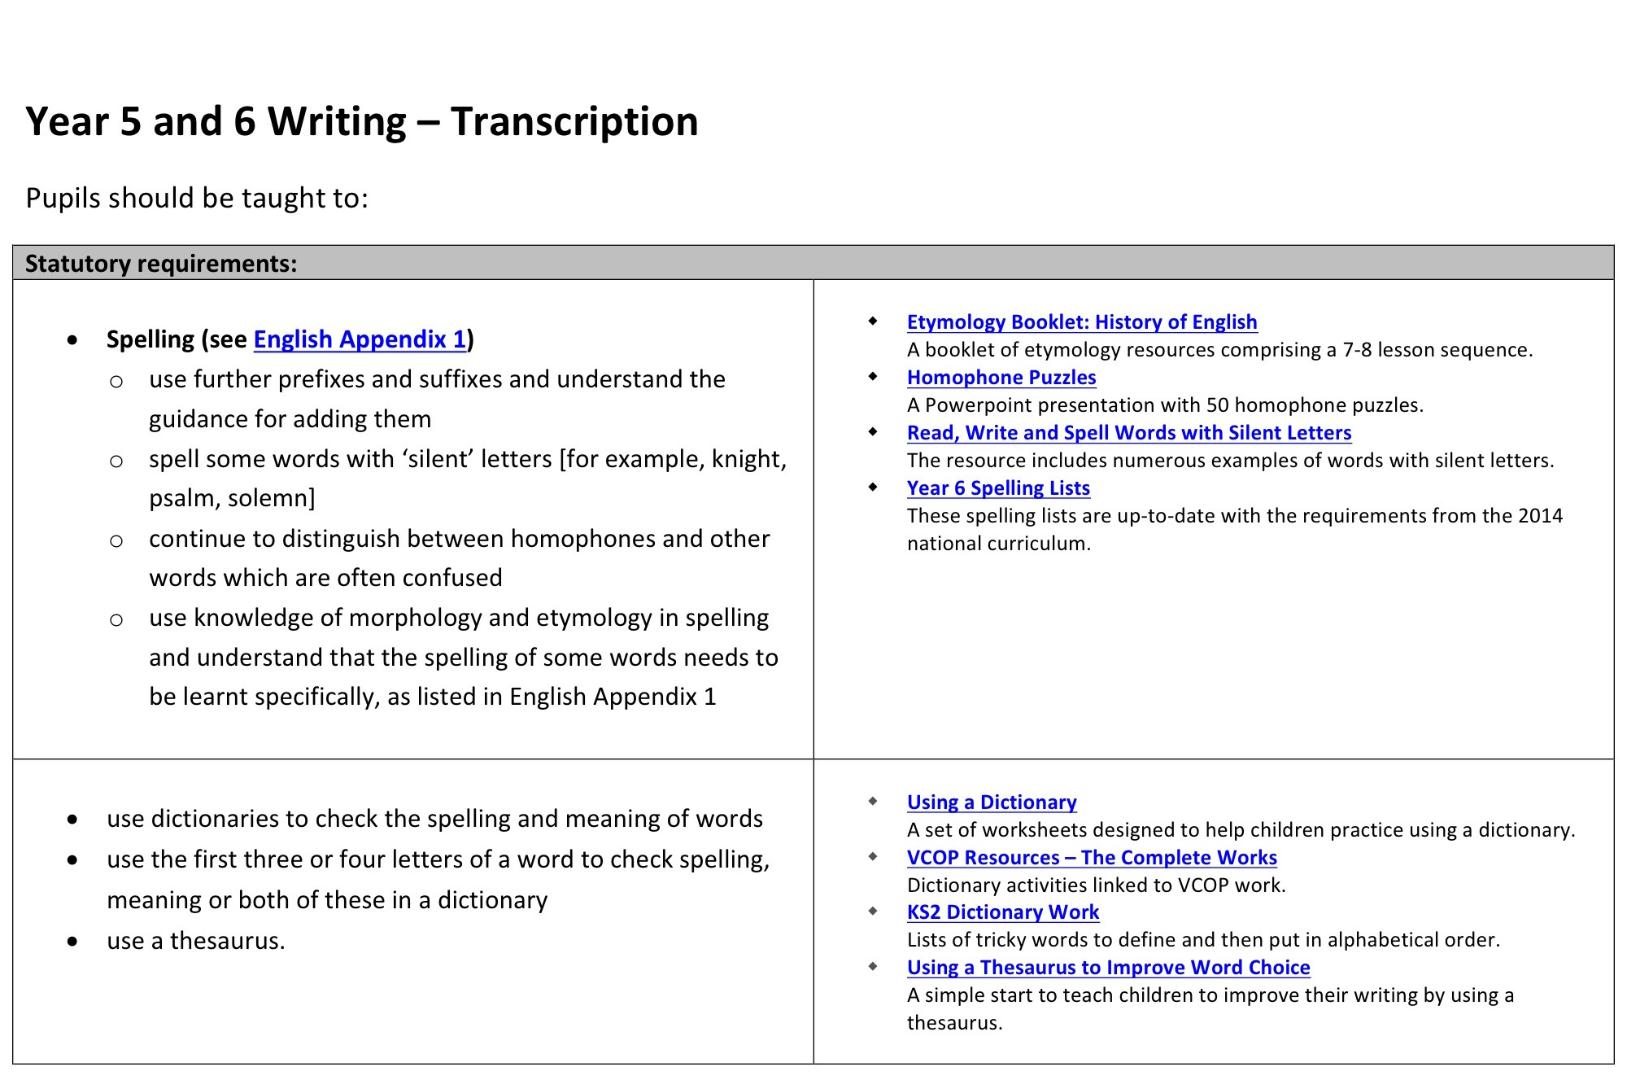 Killinghall primary school english writing trascription spiritdancerdesigns Choice Image